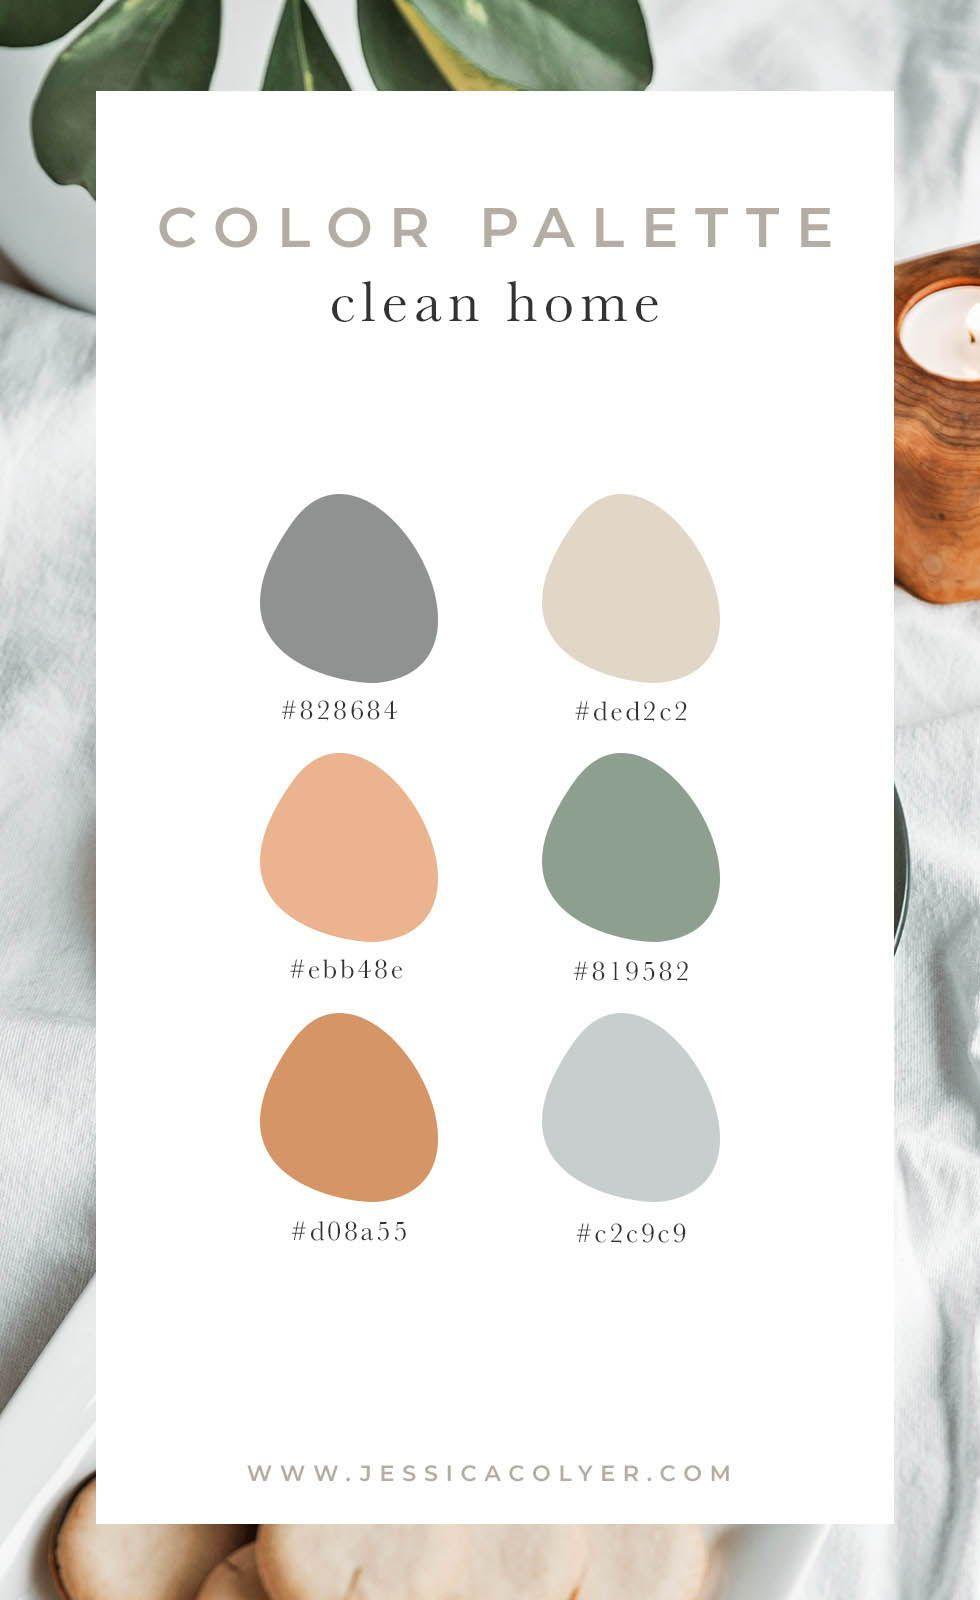 Colors — Jessica Colyer |  Designer, Brand Strategist & Creative Studio #earthtones